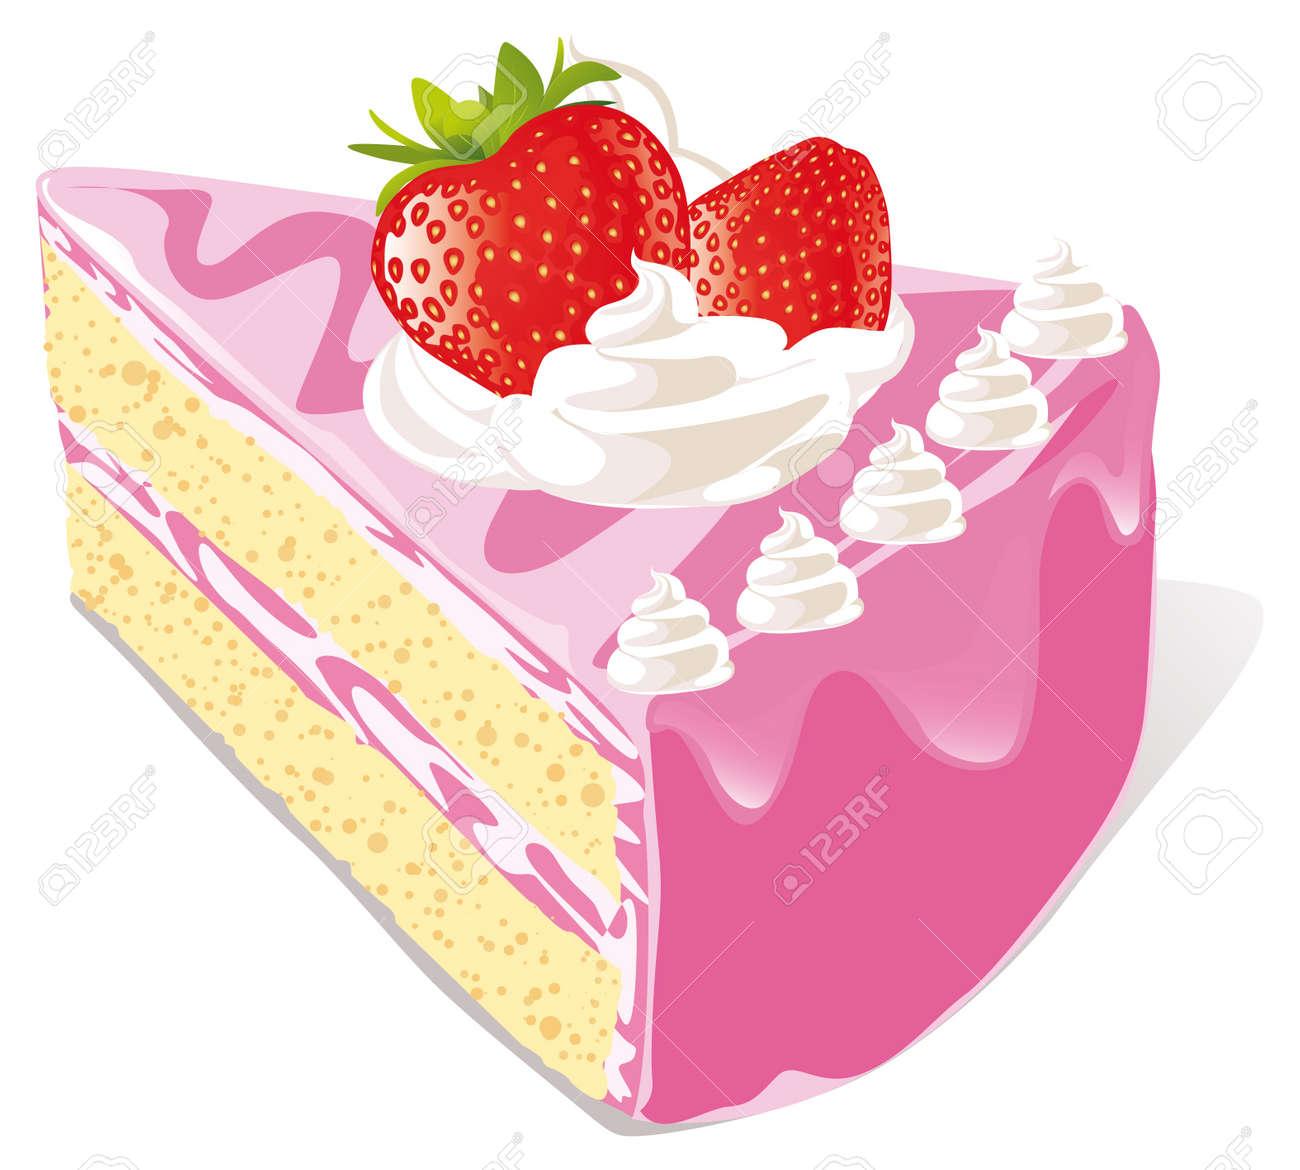 strawberry cake - 14872728